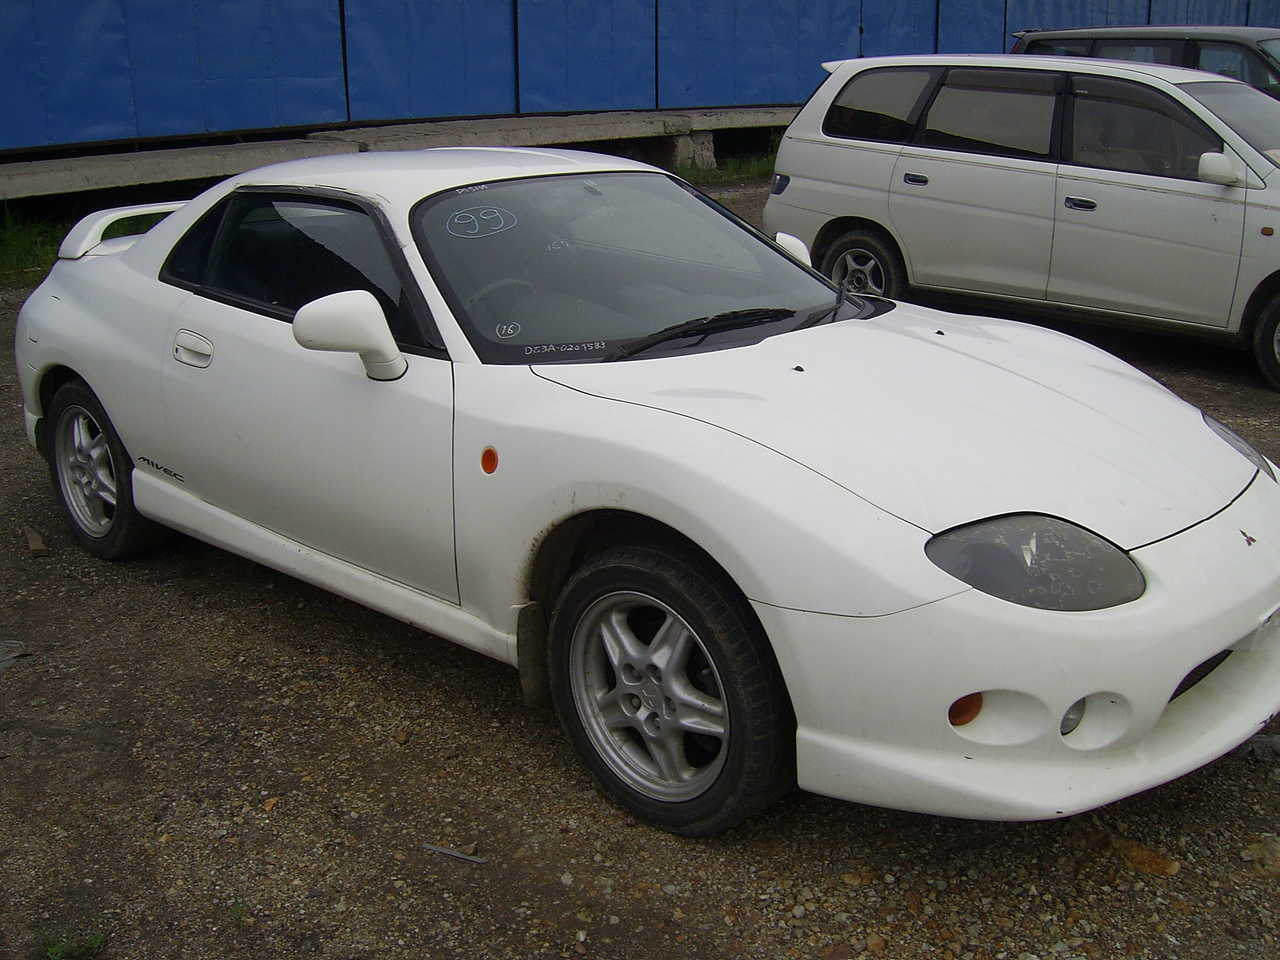 1998 mitsubishi fto pictures 1800cc gasoline ff manual for sale rh cars directory net Mitsubishi FTO Back Mitsubishi Lancer Evolution